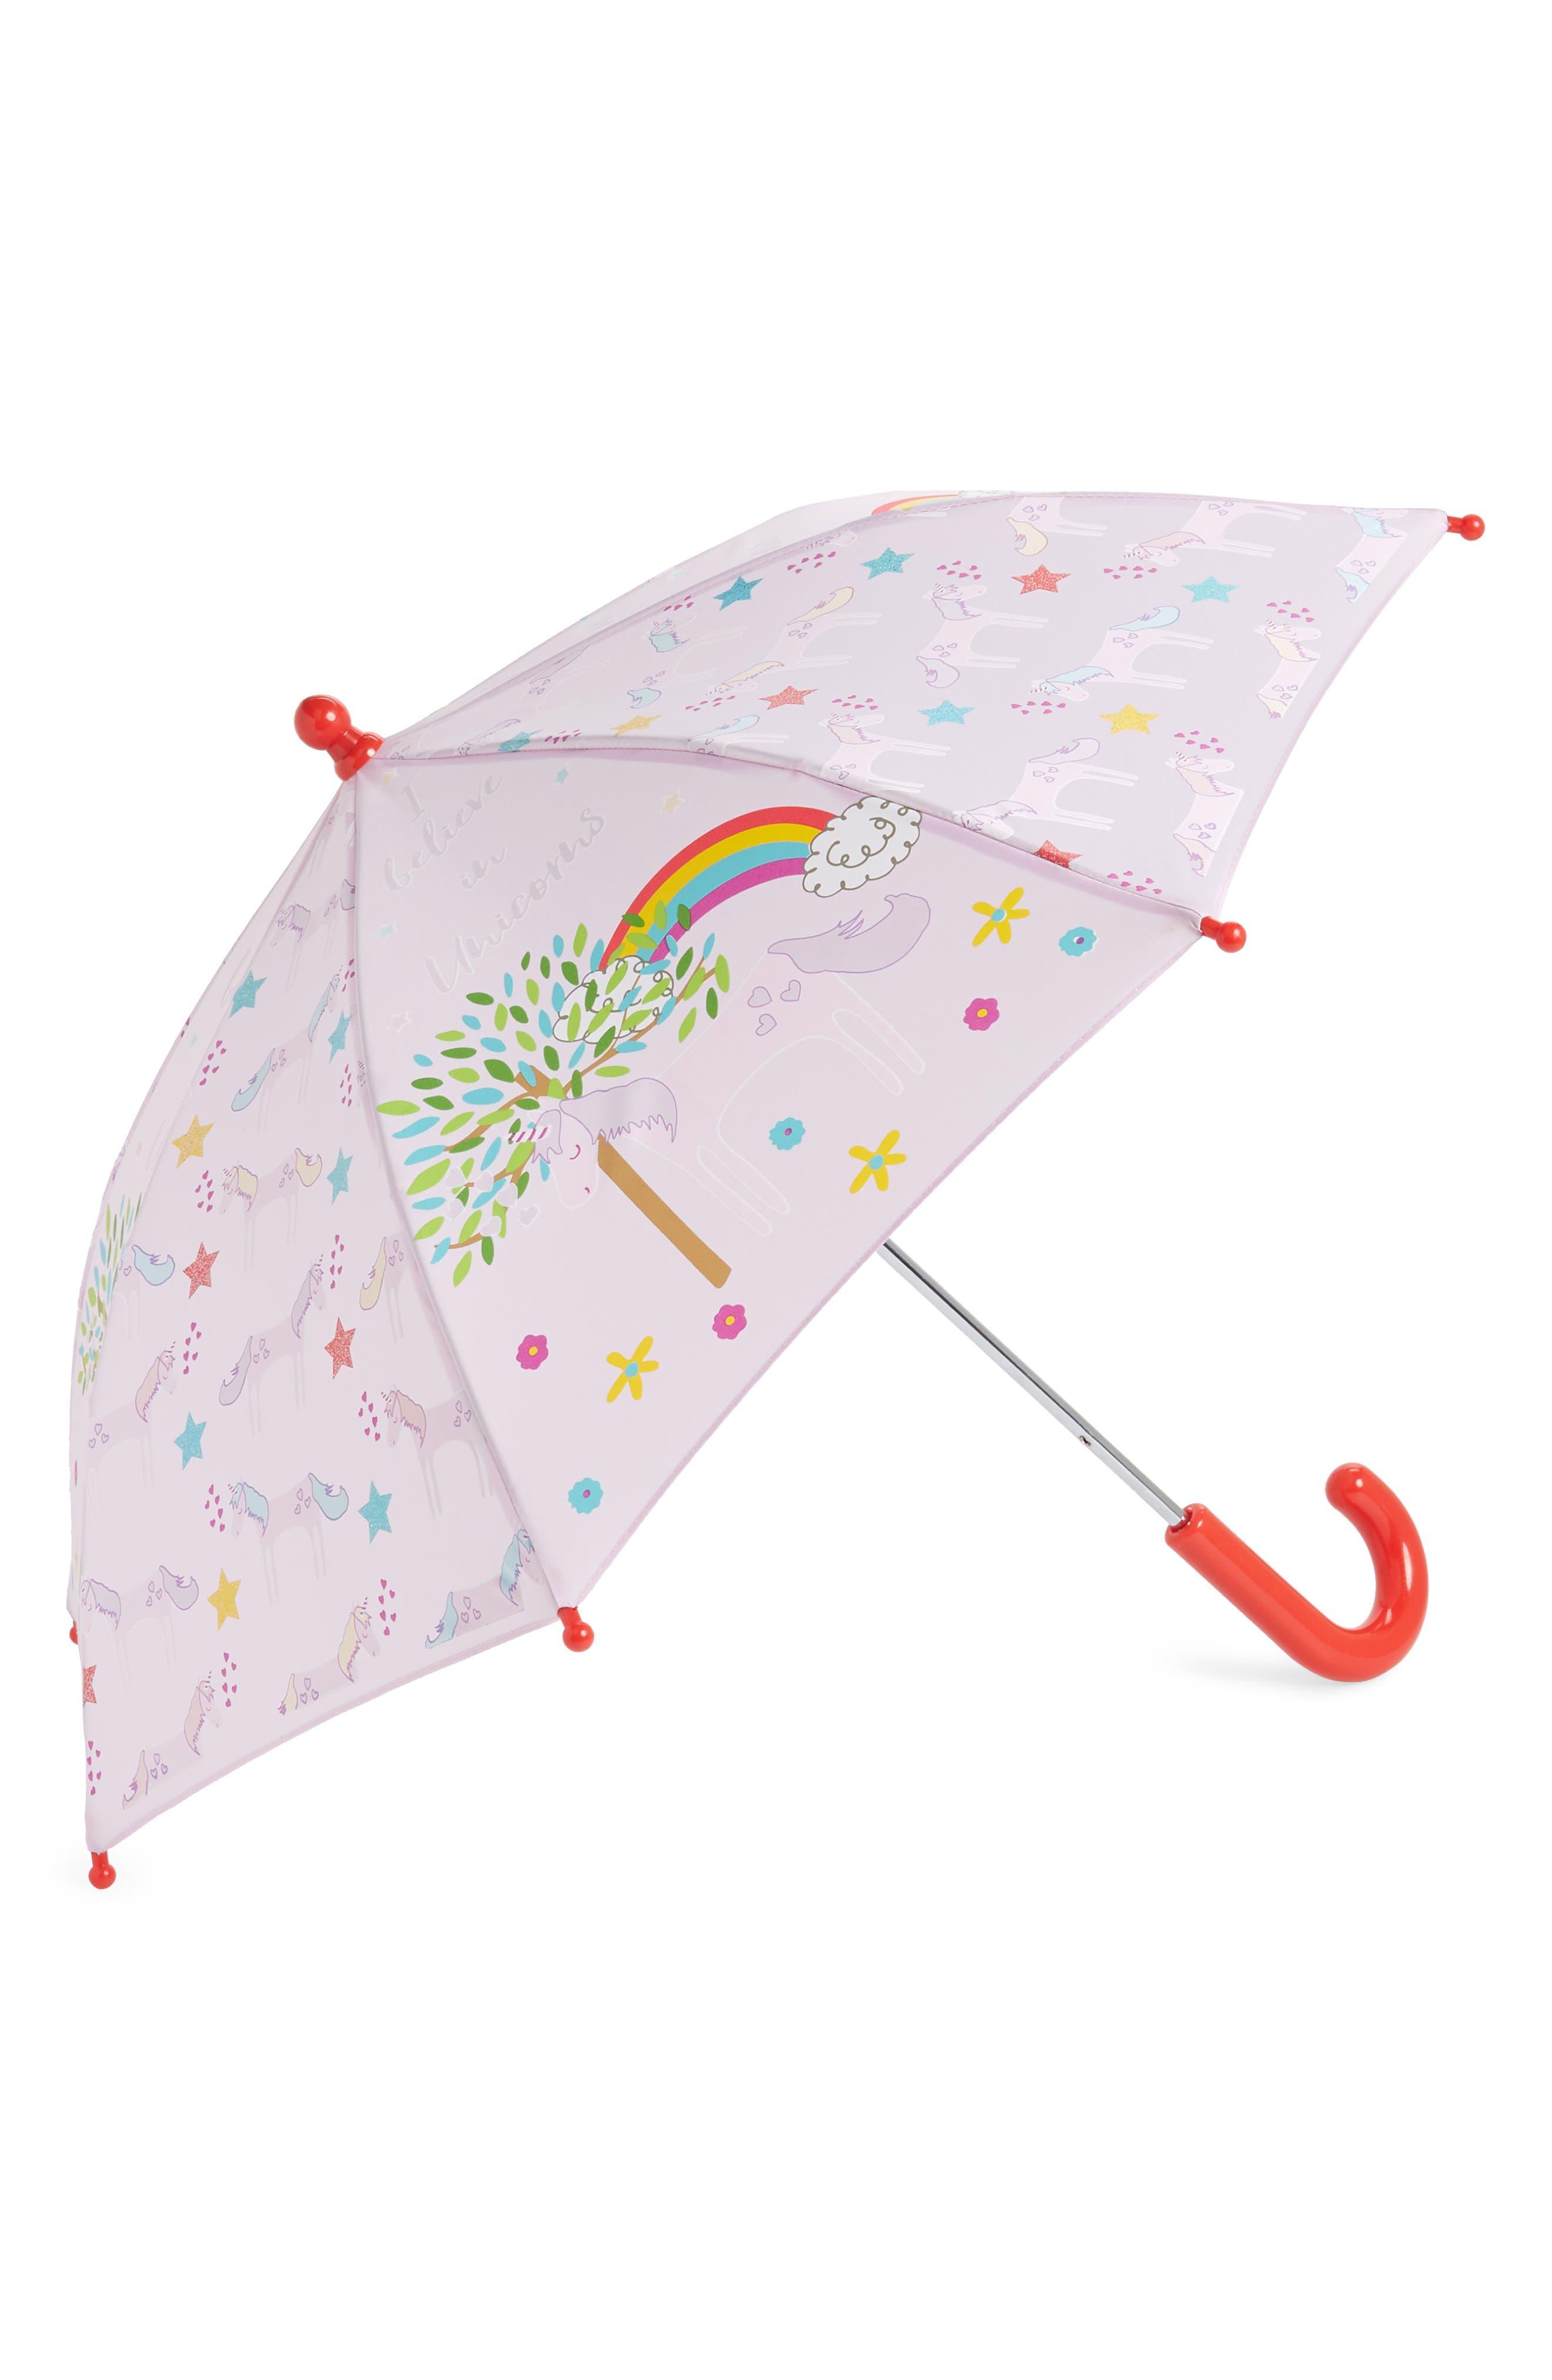 Floss & Rock Unicorn Color Changing Umbrella,                         Main,                         color, LIGHT PINK